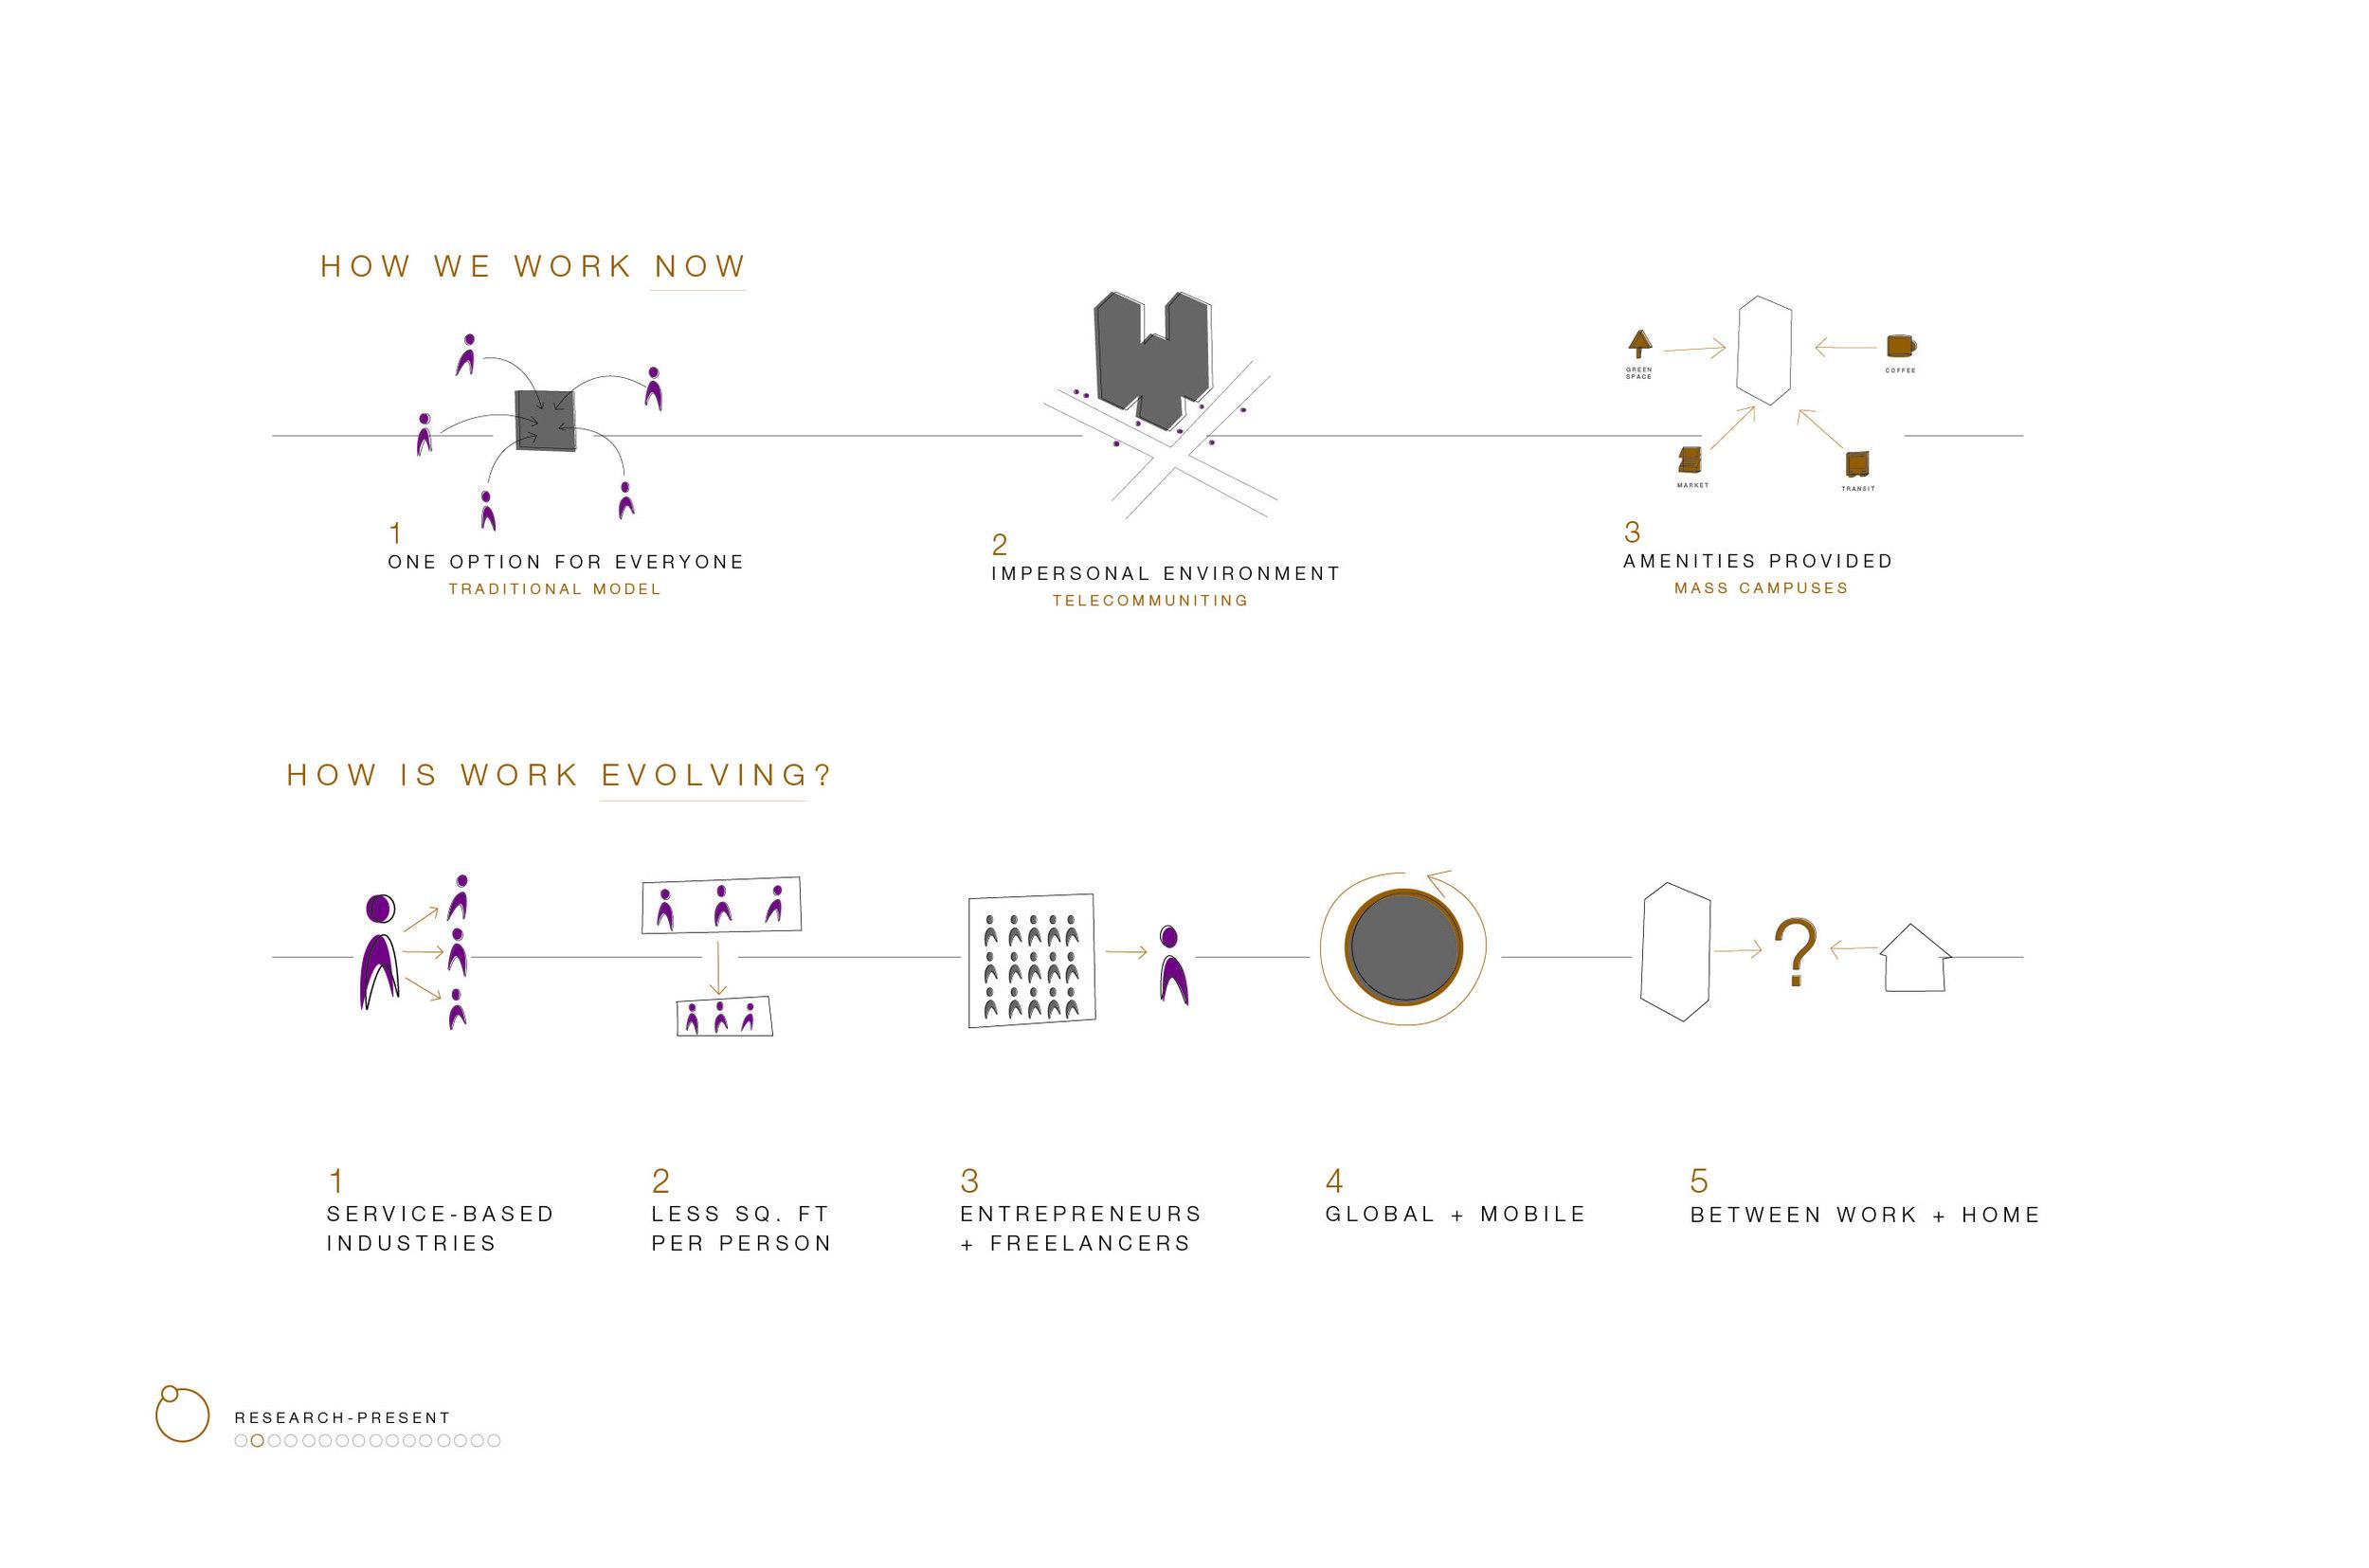 11x17_presentation-02.jpg